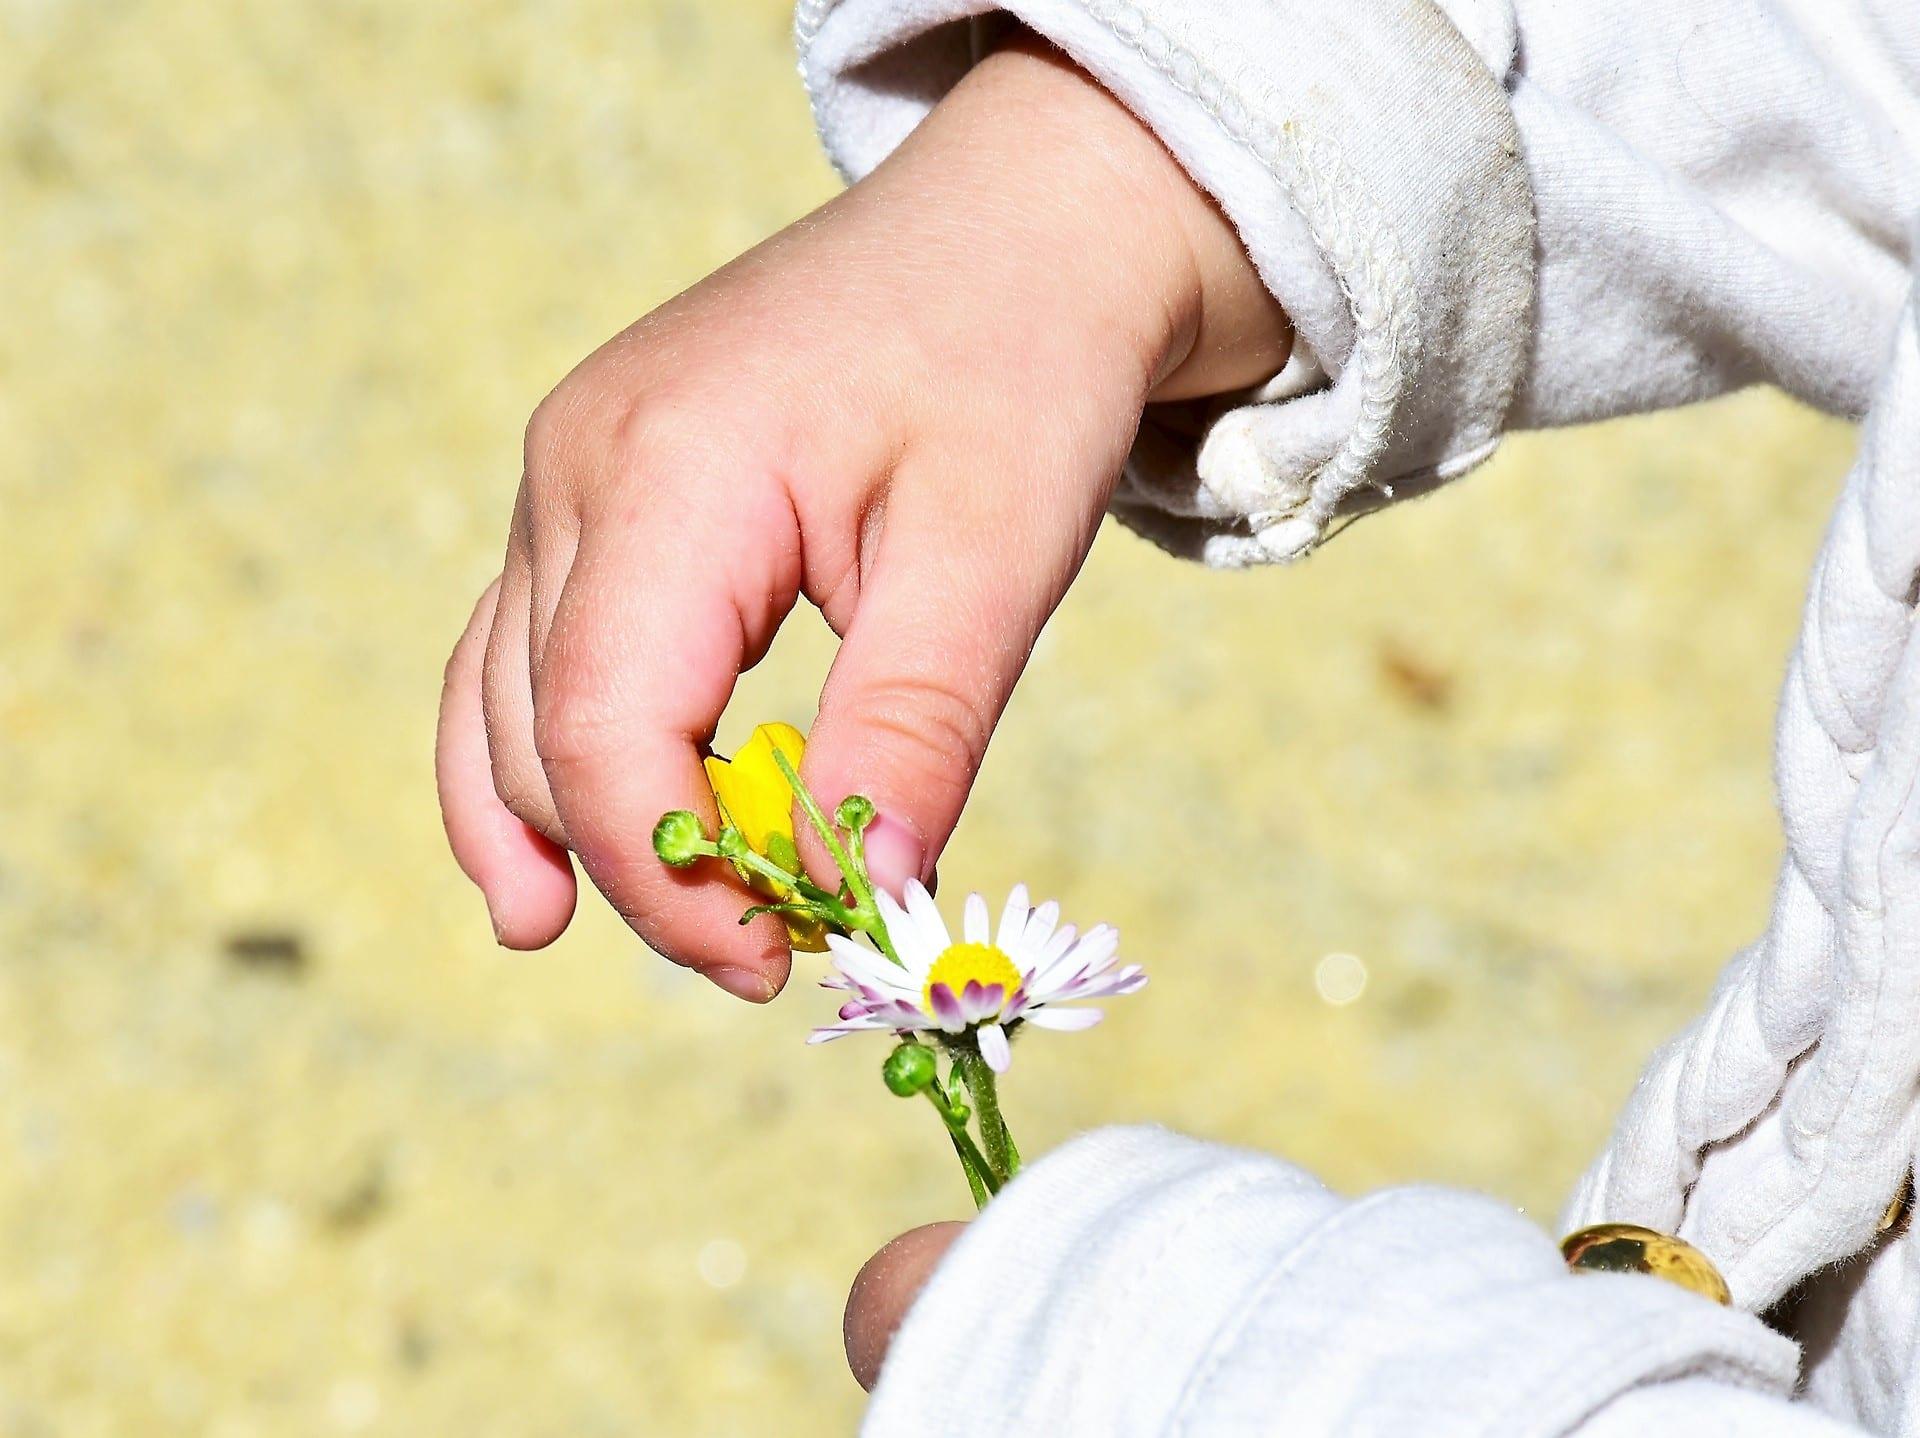 Gänseblümchen, Kind, Hand, Kinderhände, Großfamilie